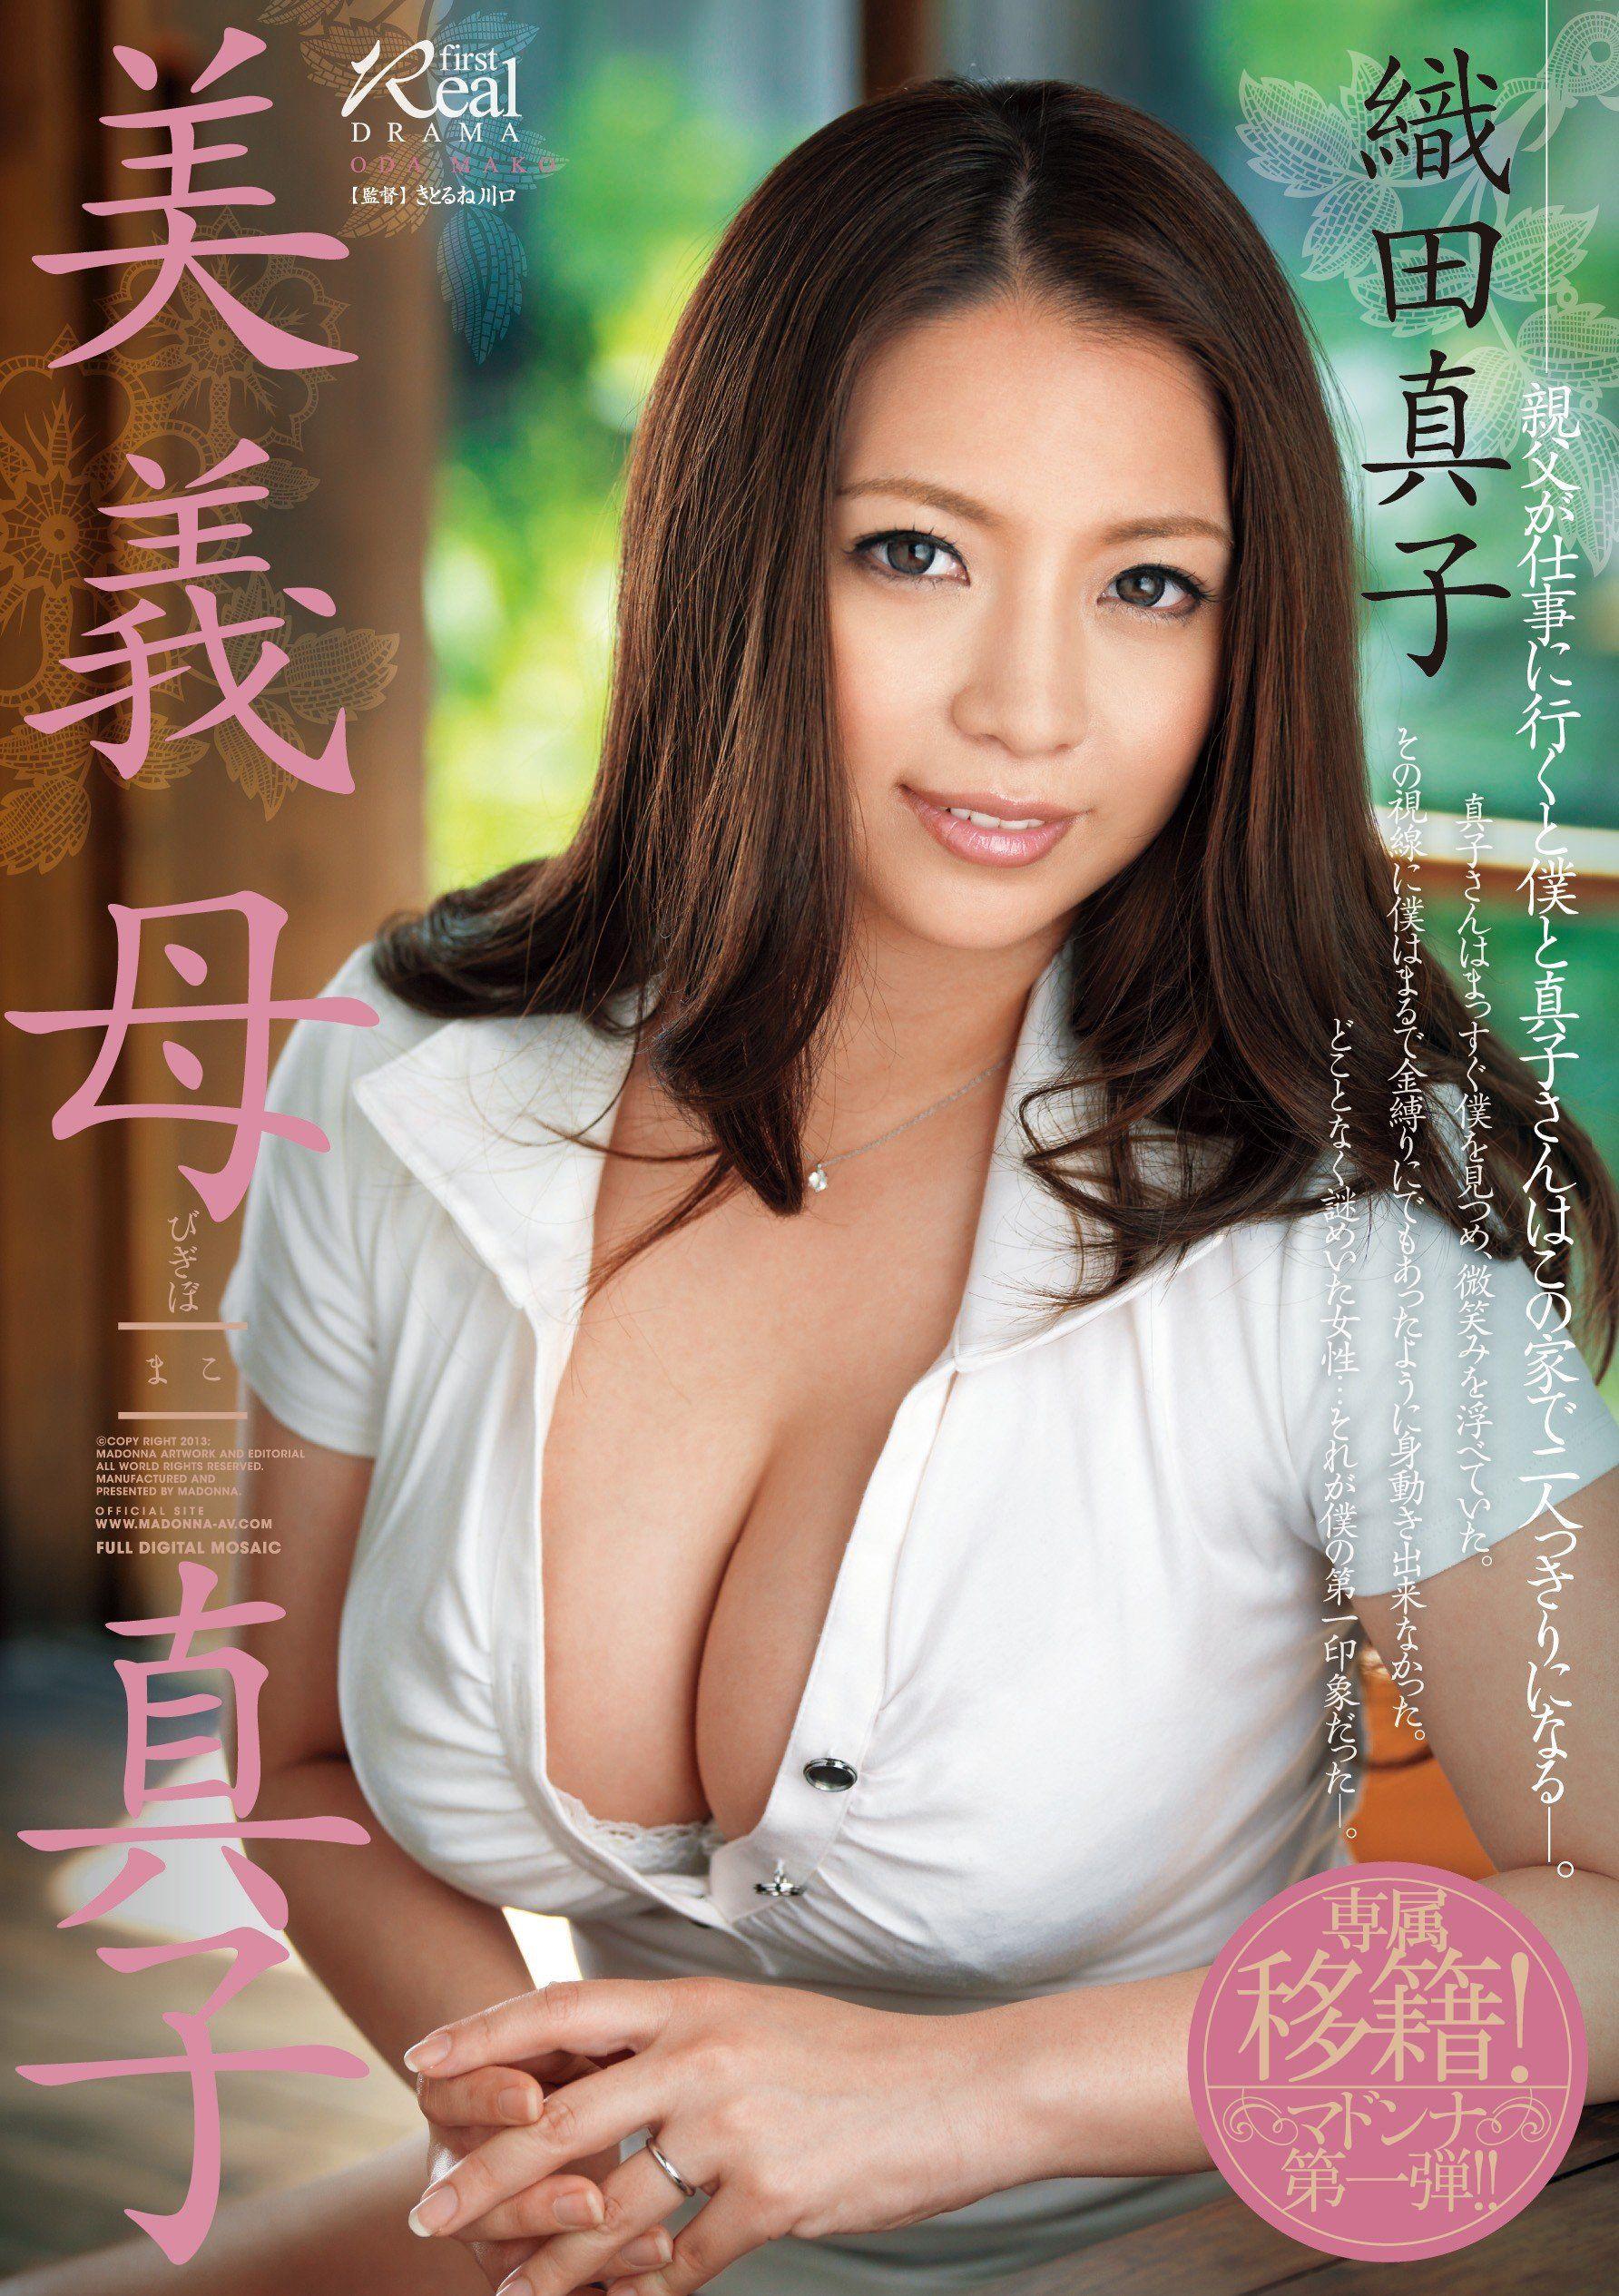 Mako Oda 2013 織田真子 Mako Oda Pinterest Asian